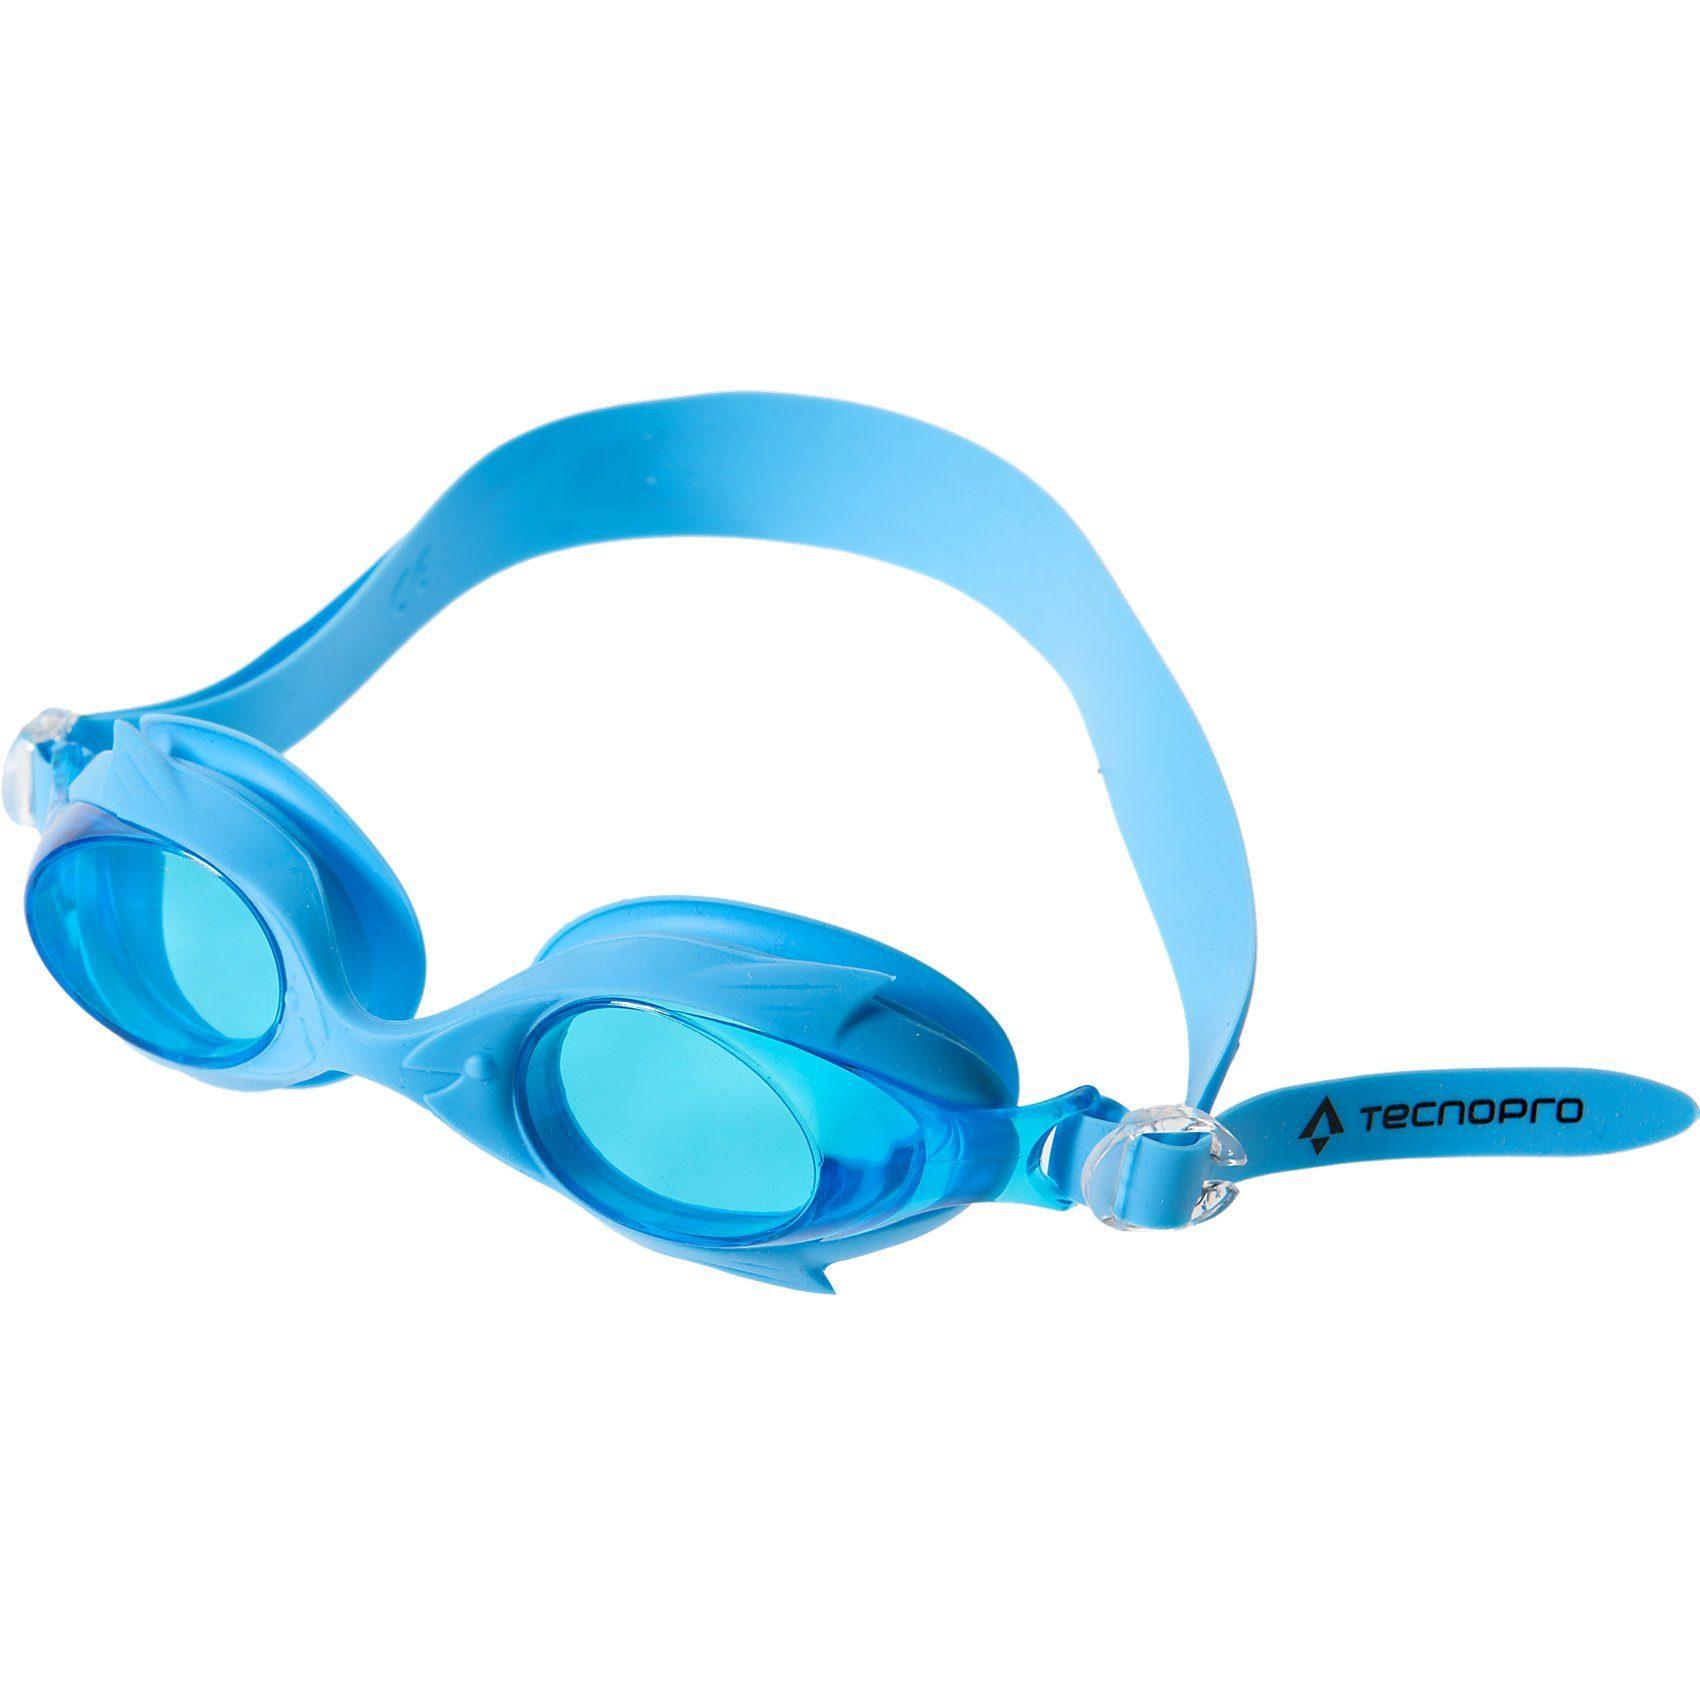 Tecnopro Schwimmbrille Shark Pro Kids, blau